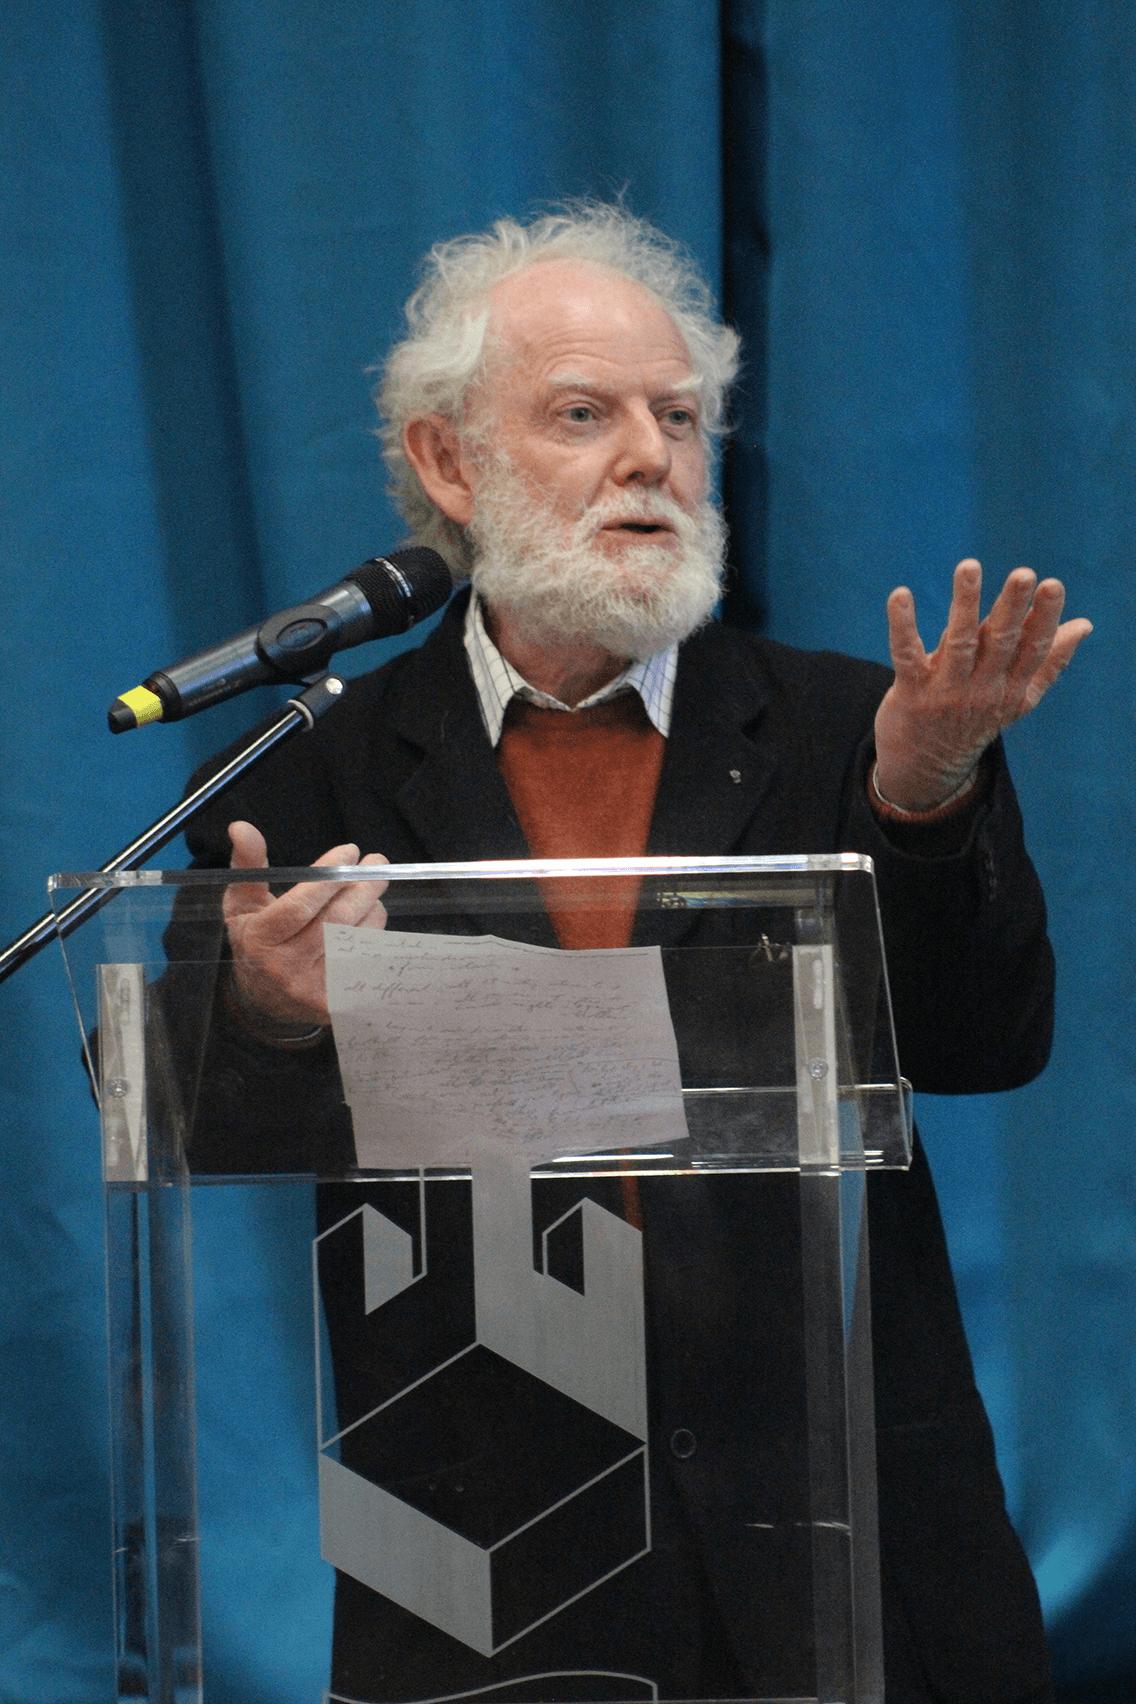 Professor Jean Michel Massing giving a speach